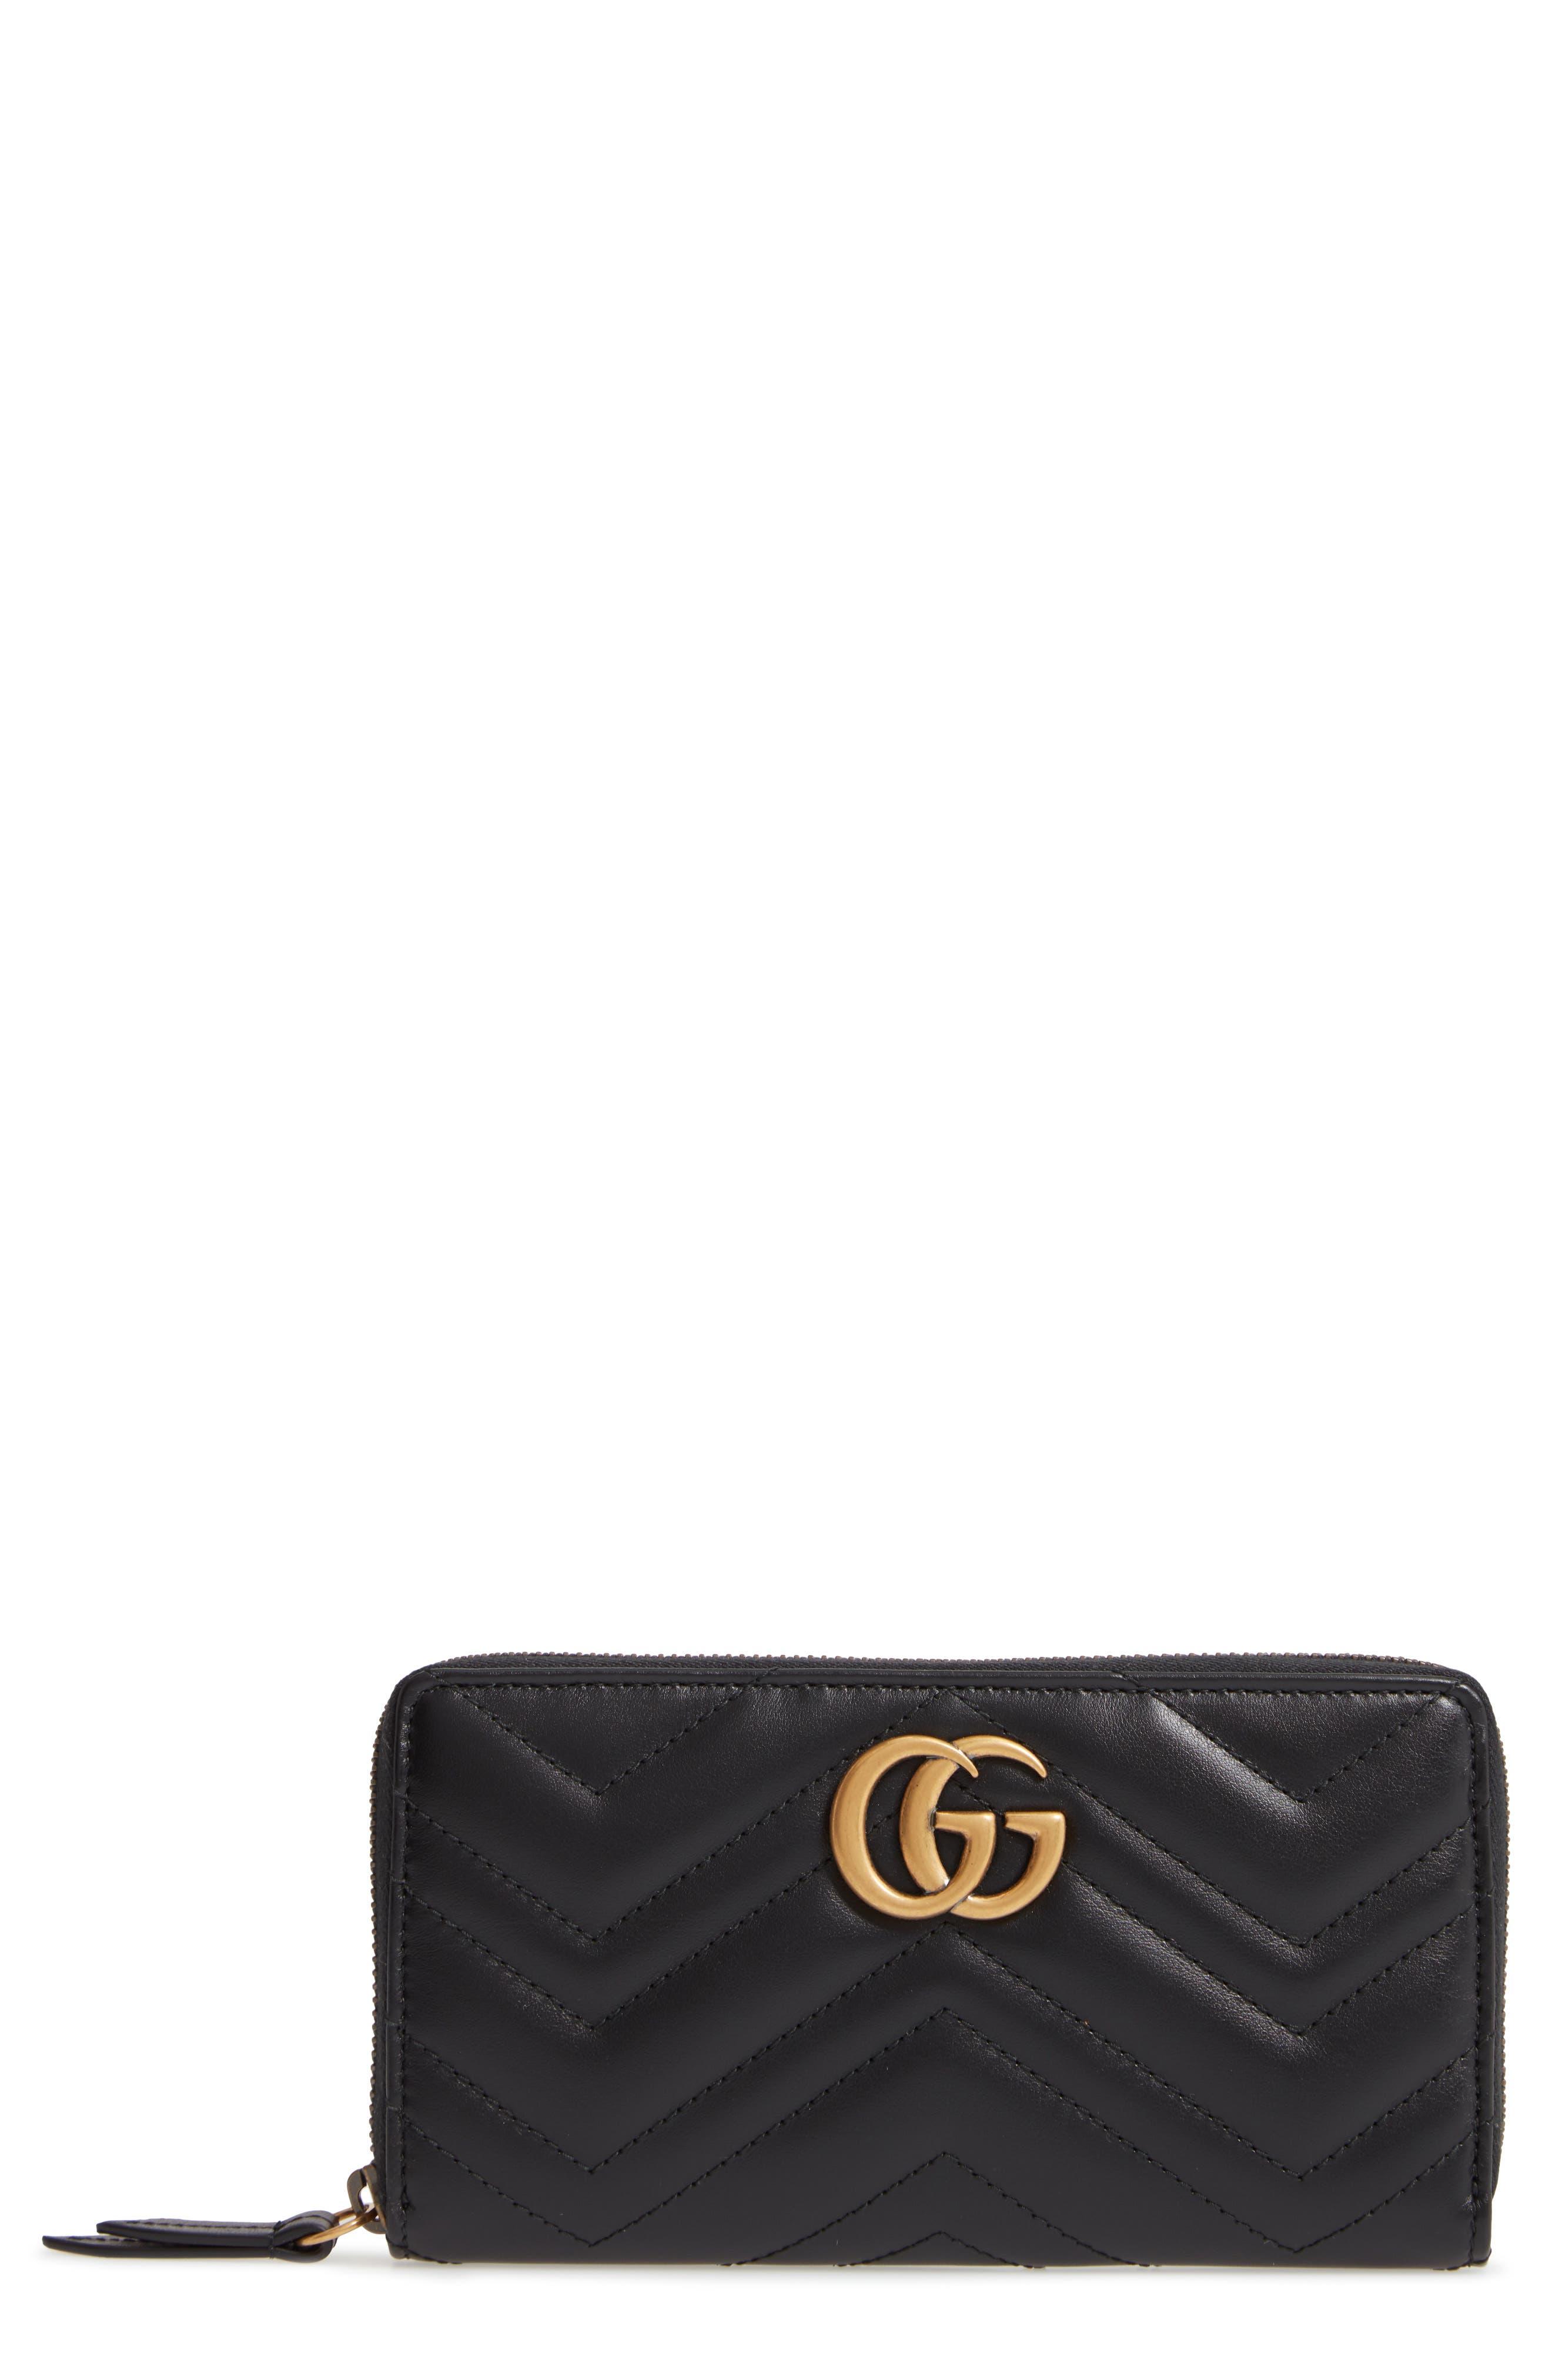 GG Marmont 2.0 Zip Around Wallet, Main, color, NERO